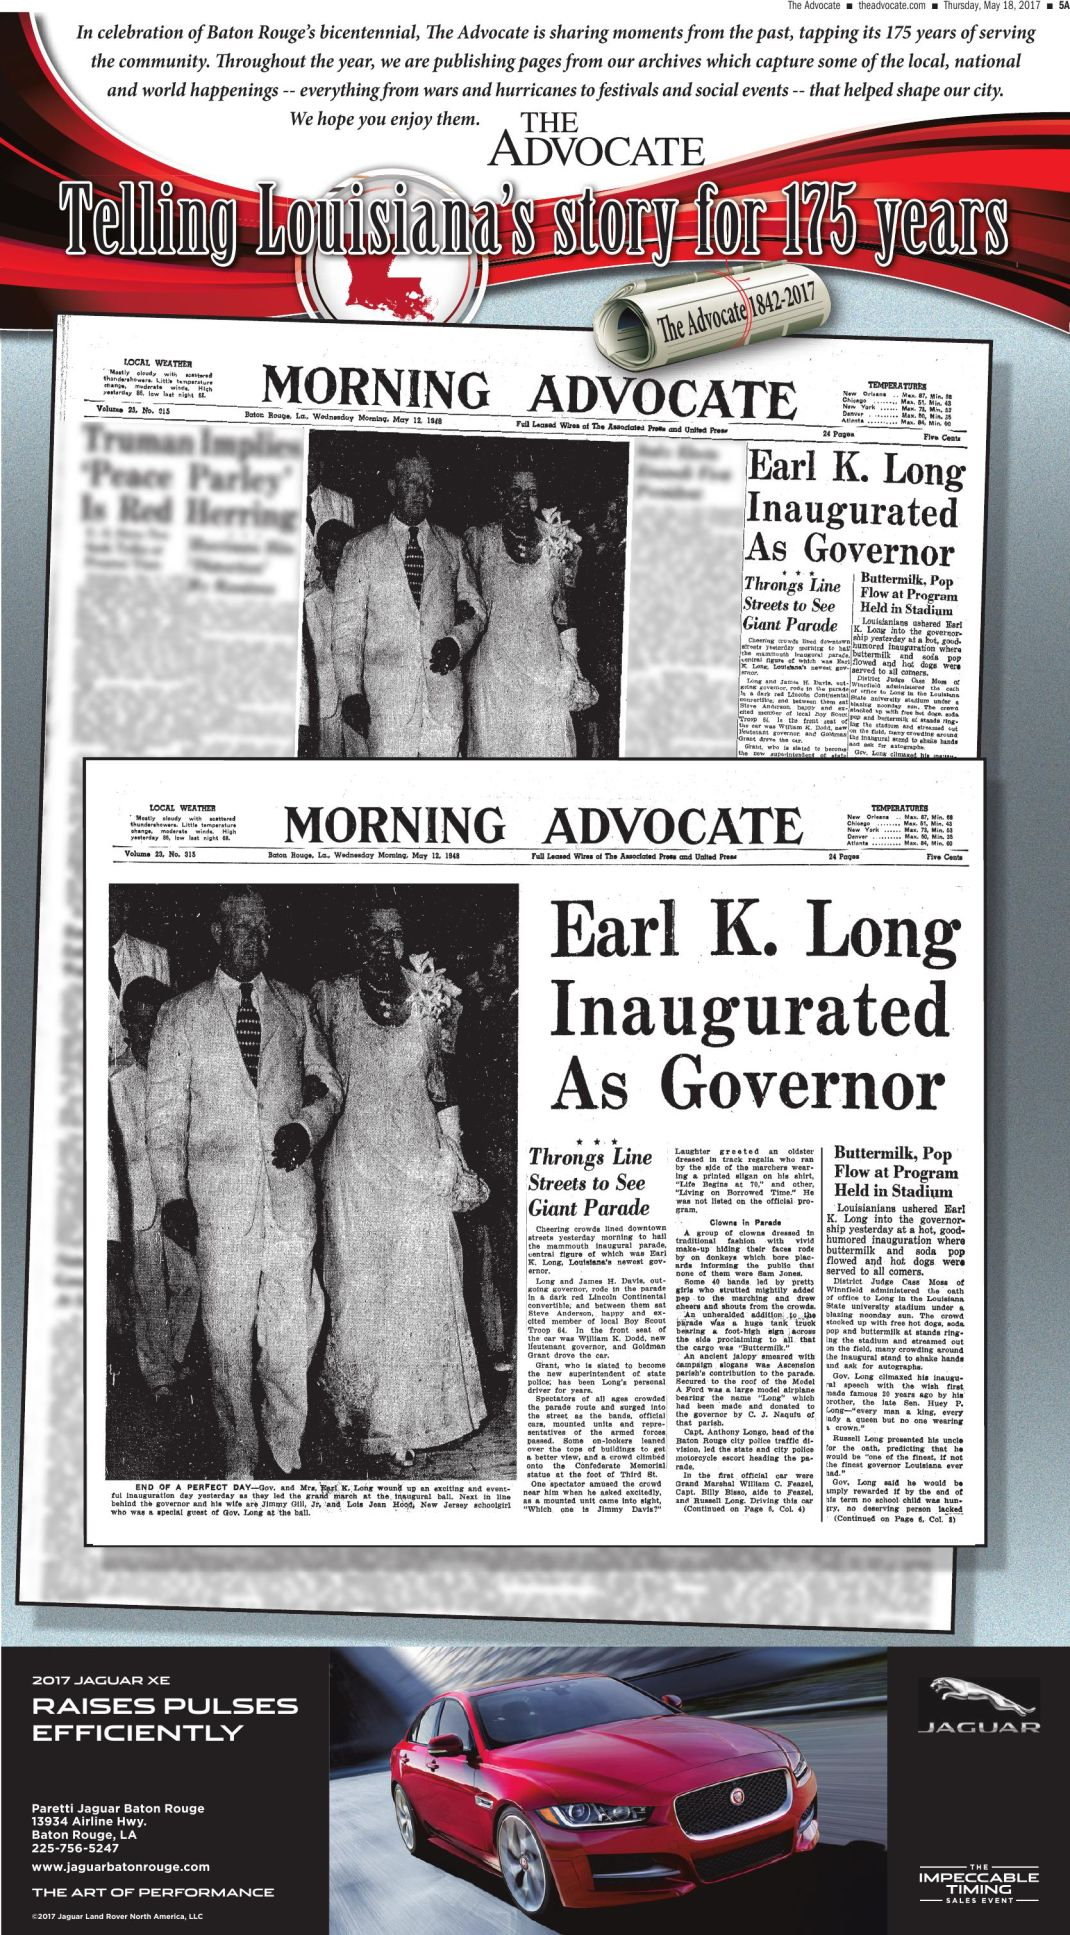 Earl K Long Inaugurated